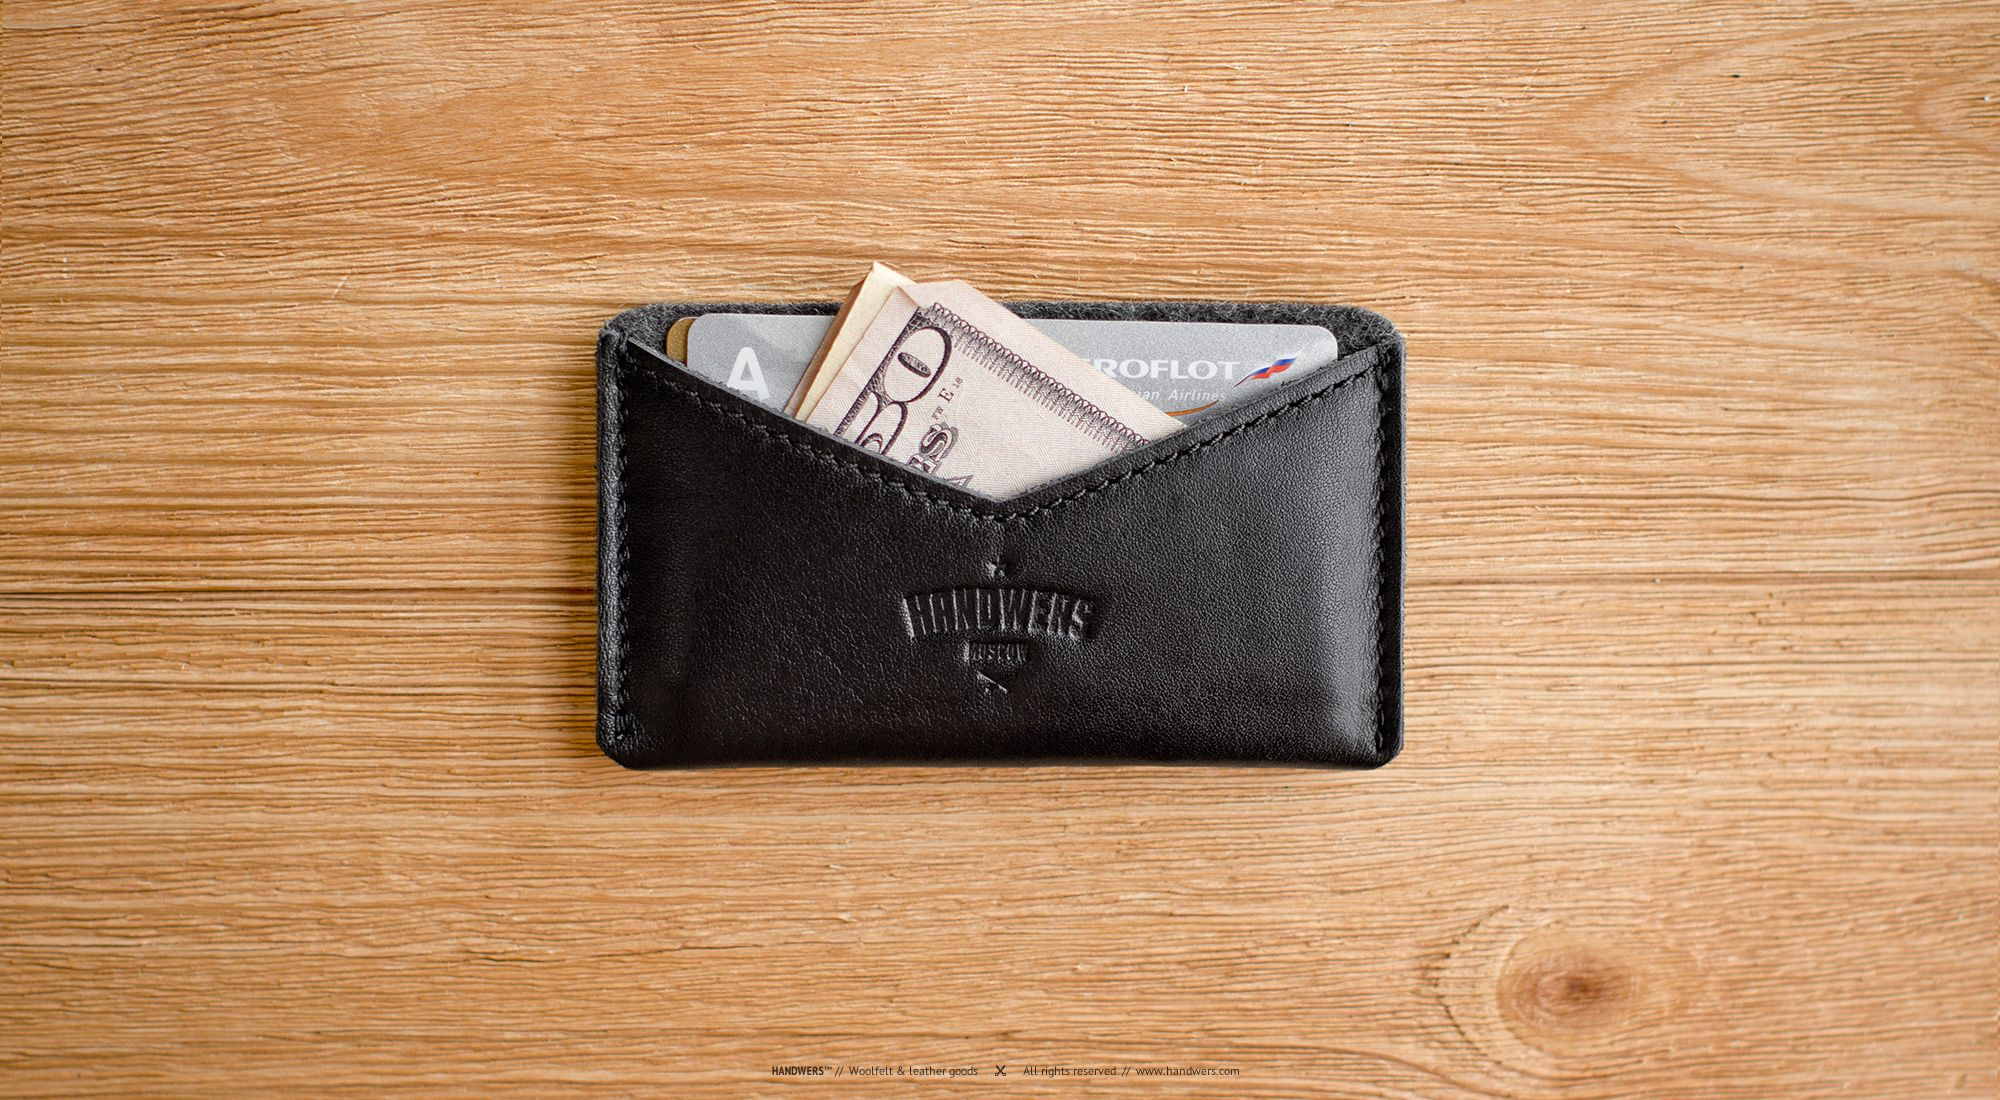 b902ba115e20 Cardholder    CHASTE  Handwers  leather  woolfelt  cardholder ...